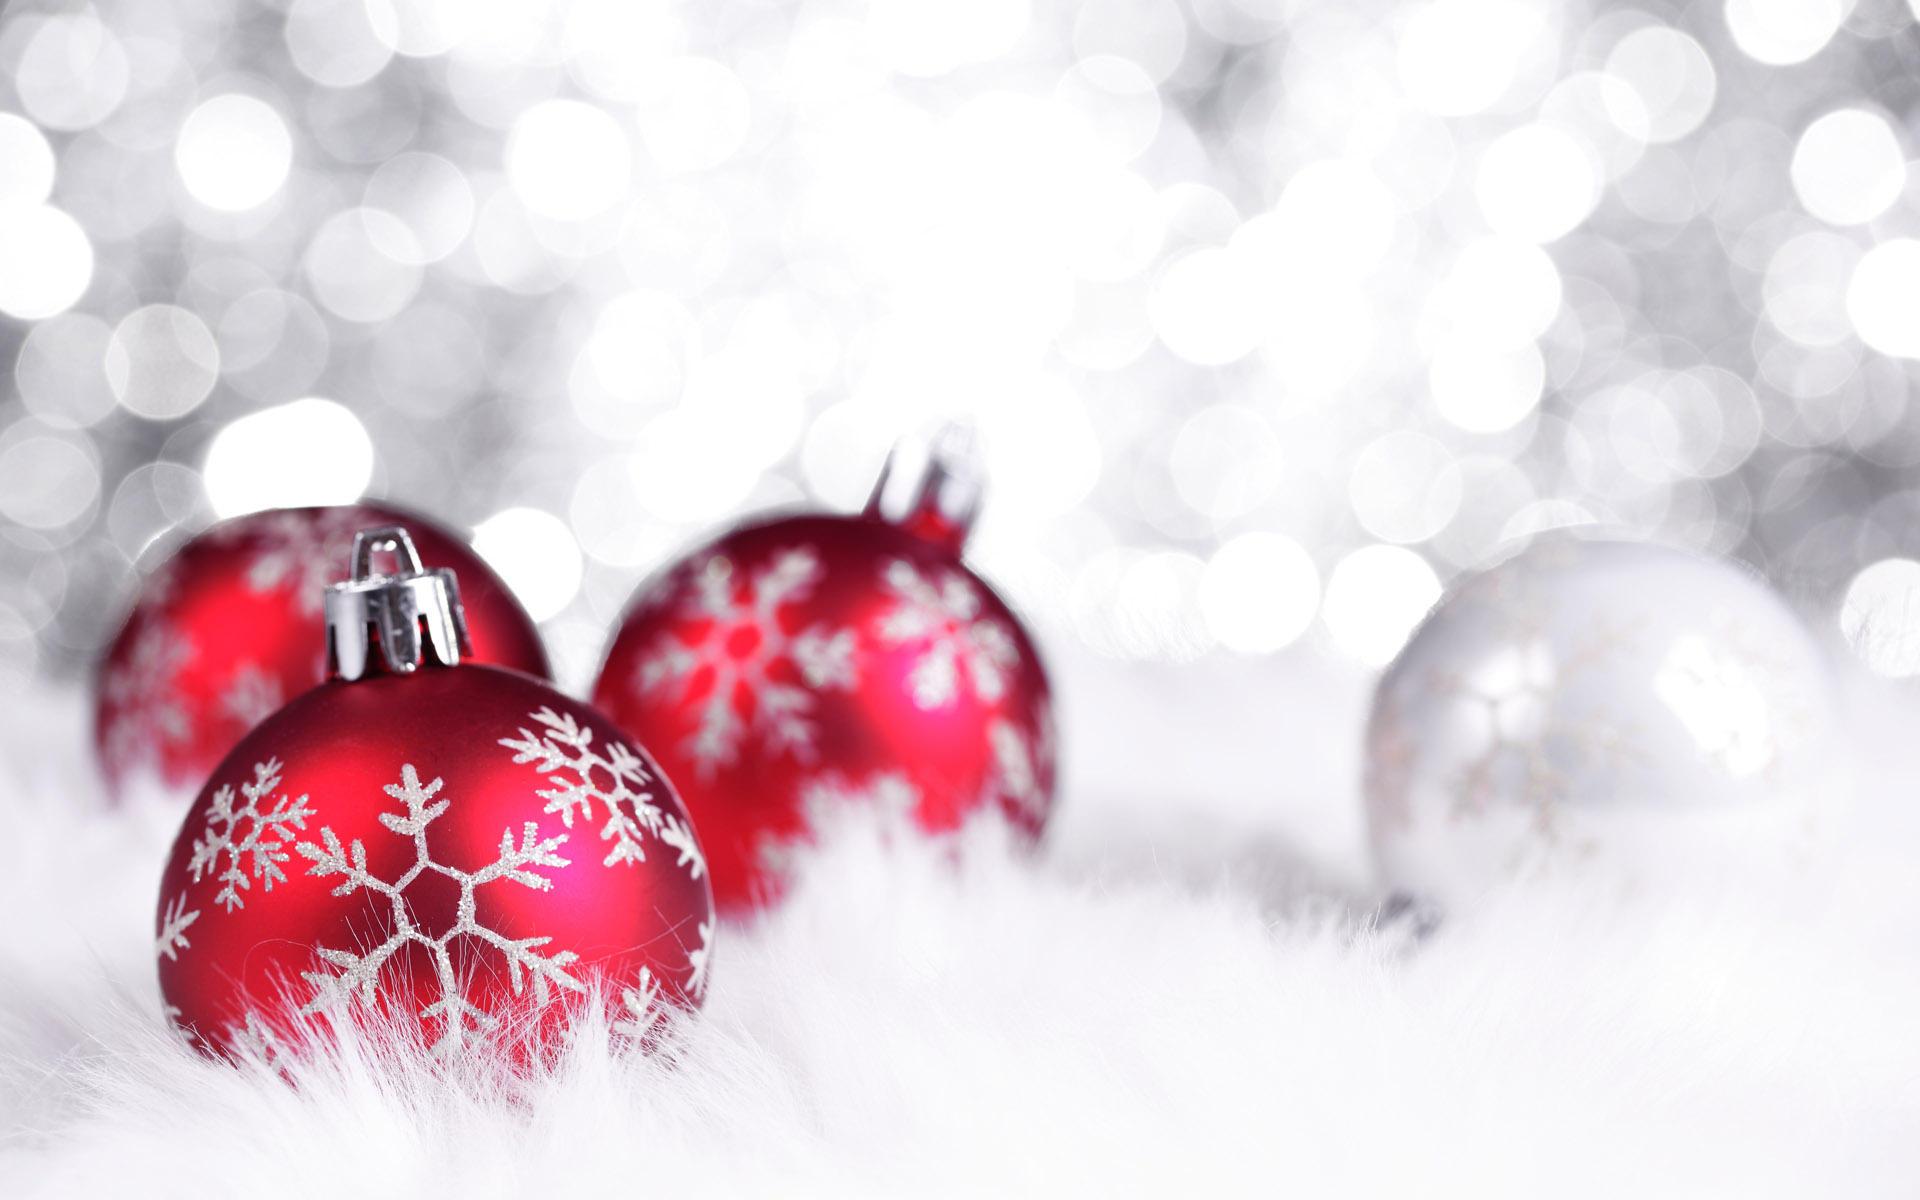 Best-Colorful-Christmas-Wallpapers-8.jpg